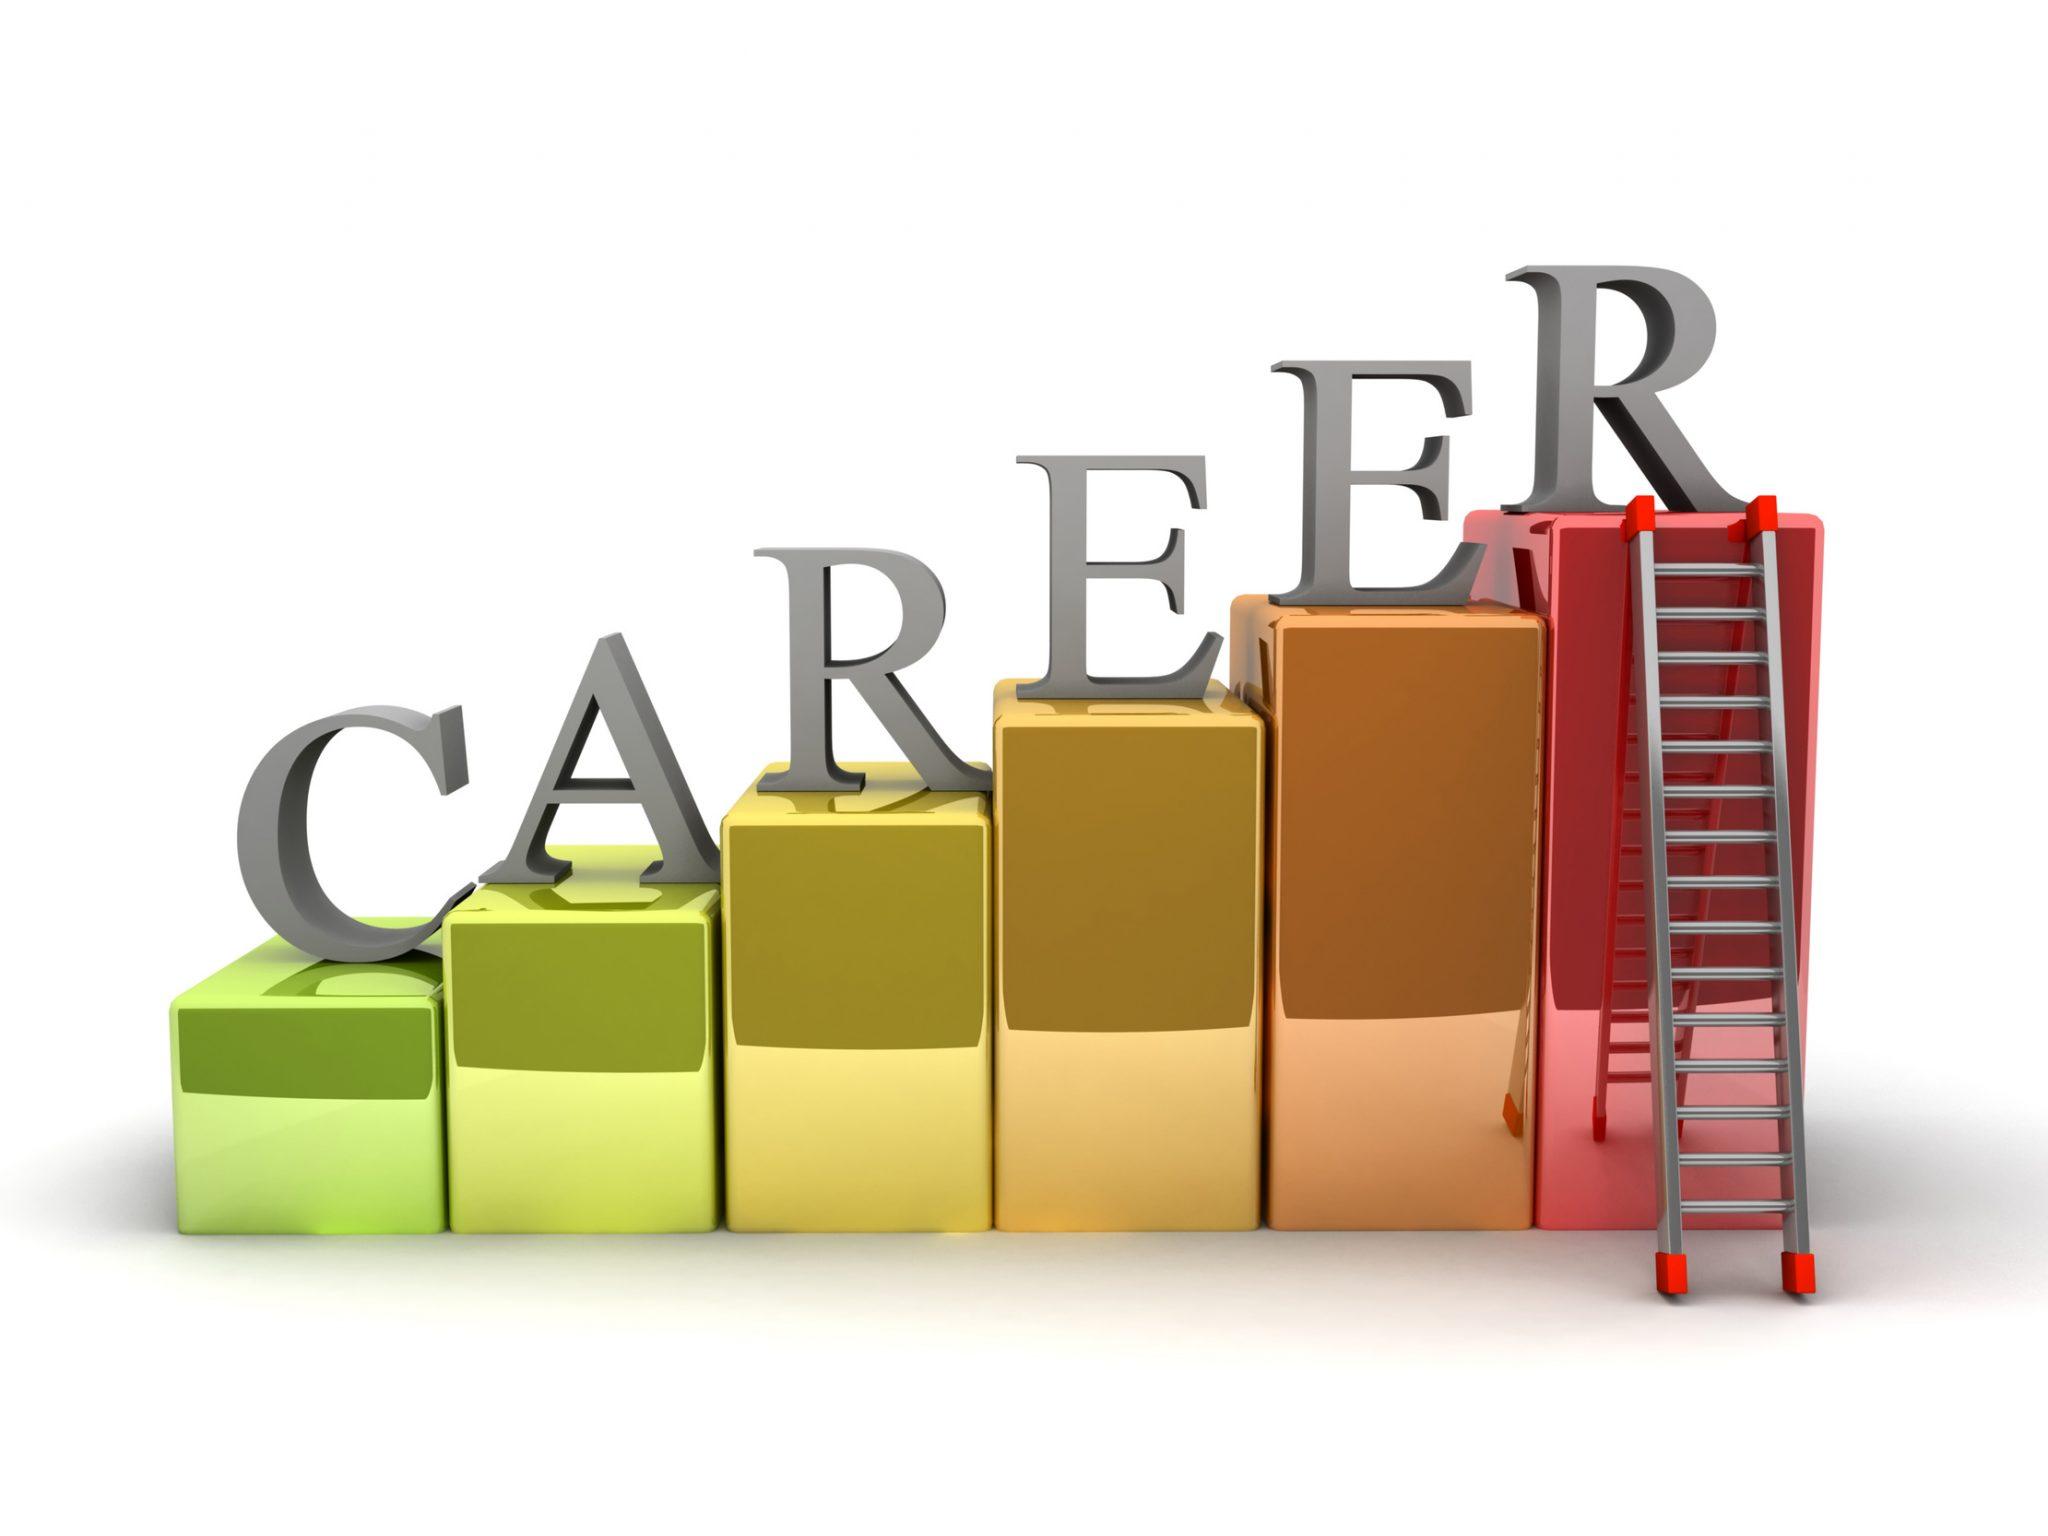 Get mentored promoted eliven. Career clipart career development